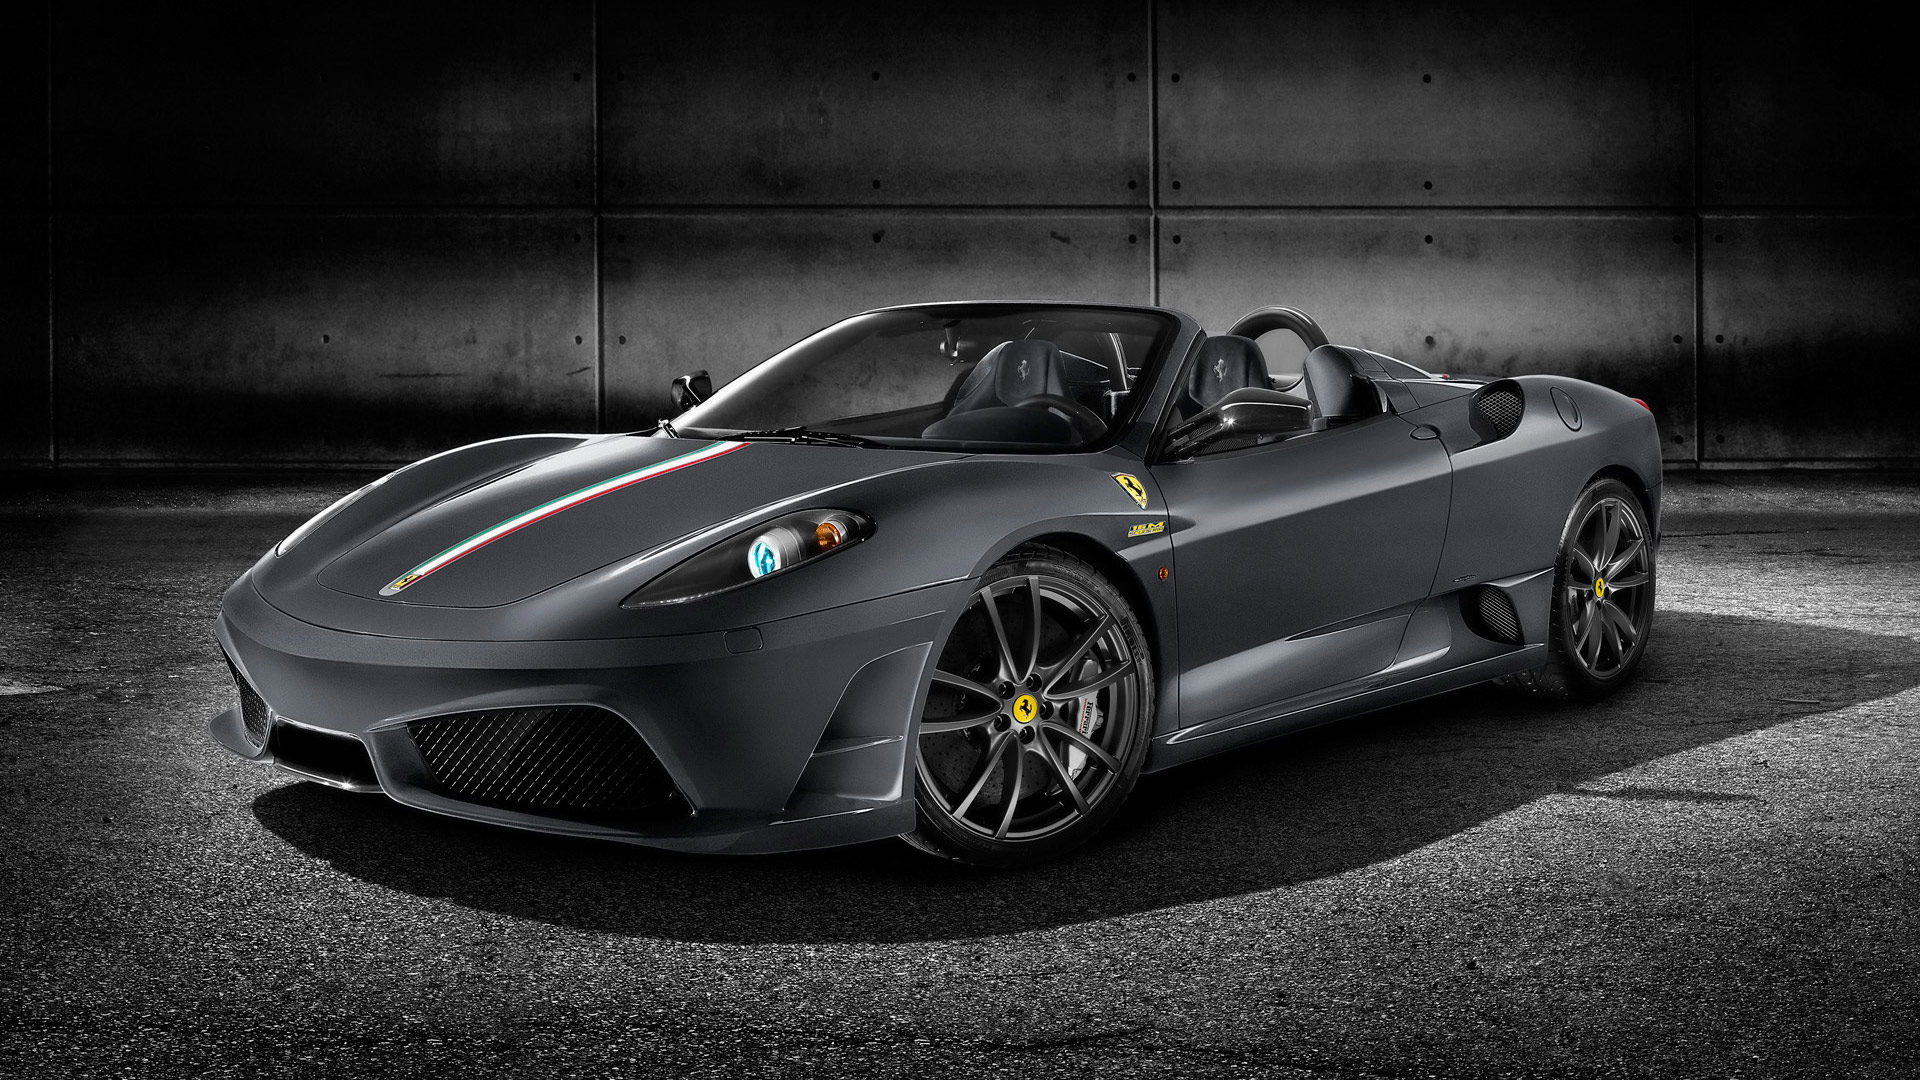 Ferrari Scuderia Spider HDTV 1080p Wallpapers HD Wallpapers 1920x1080